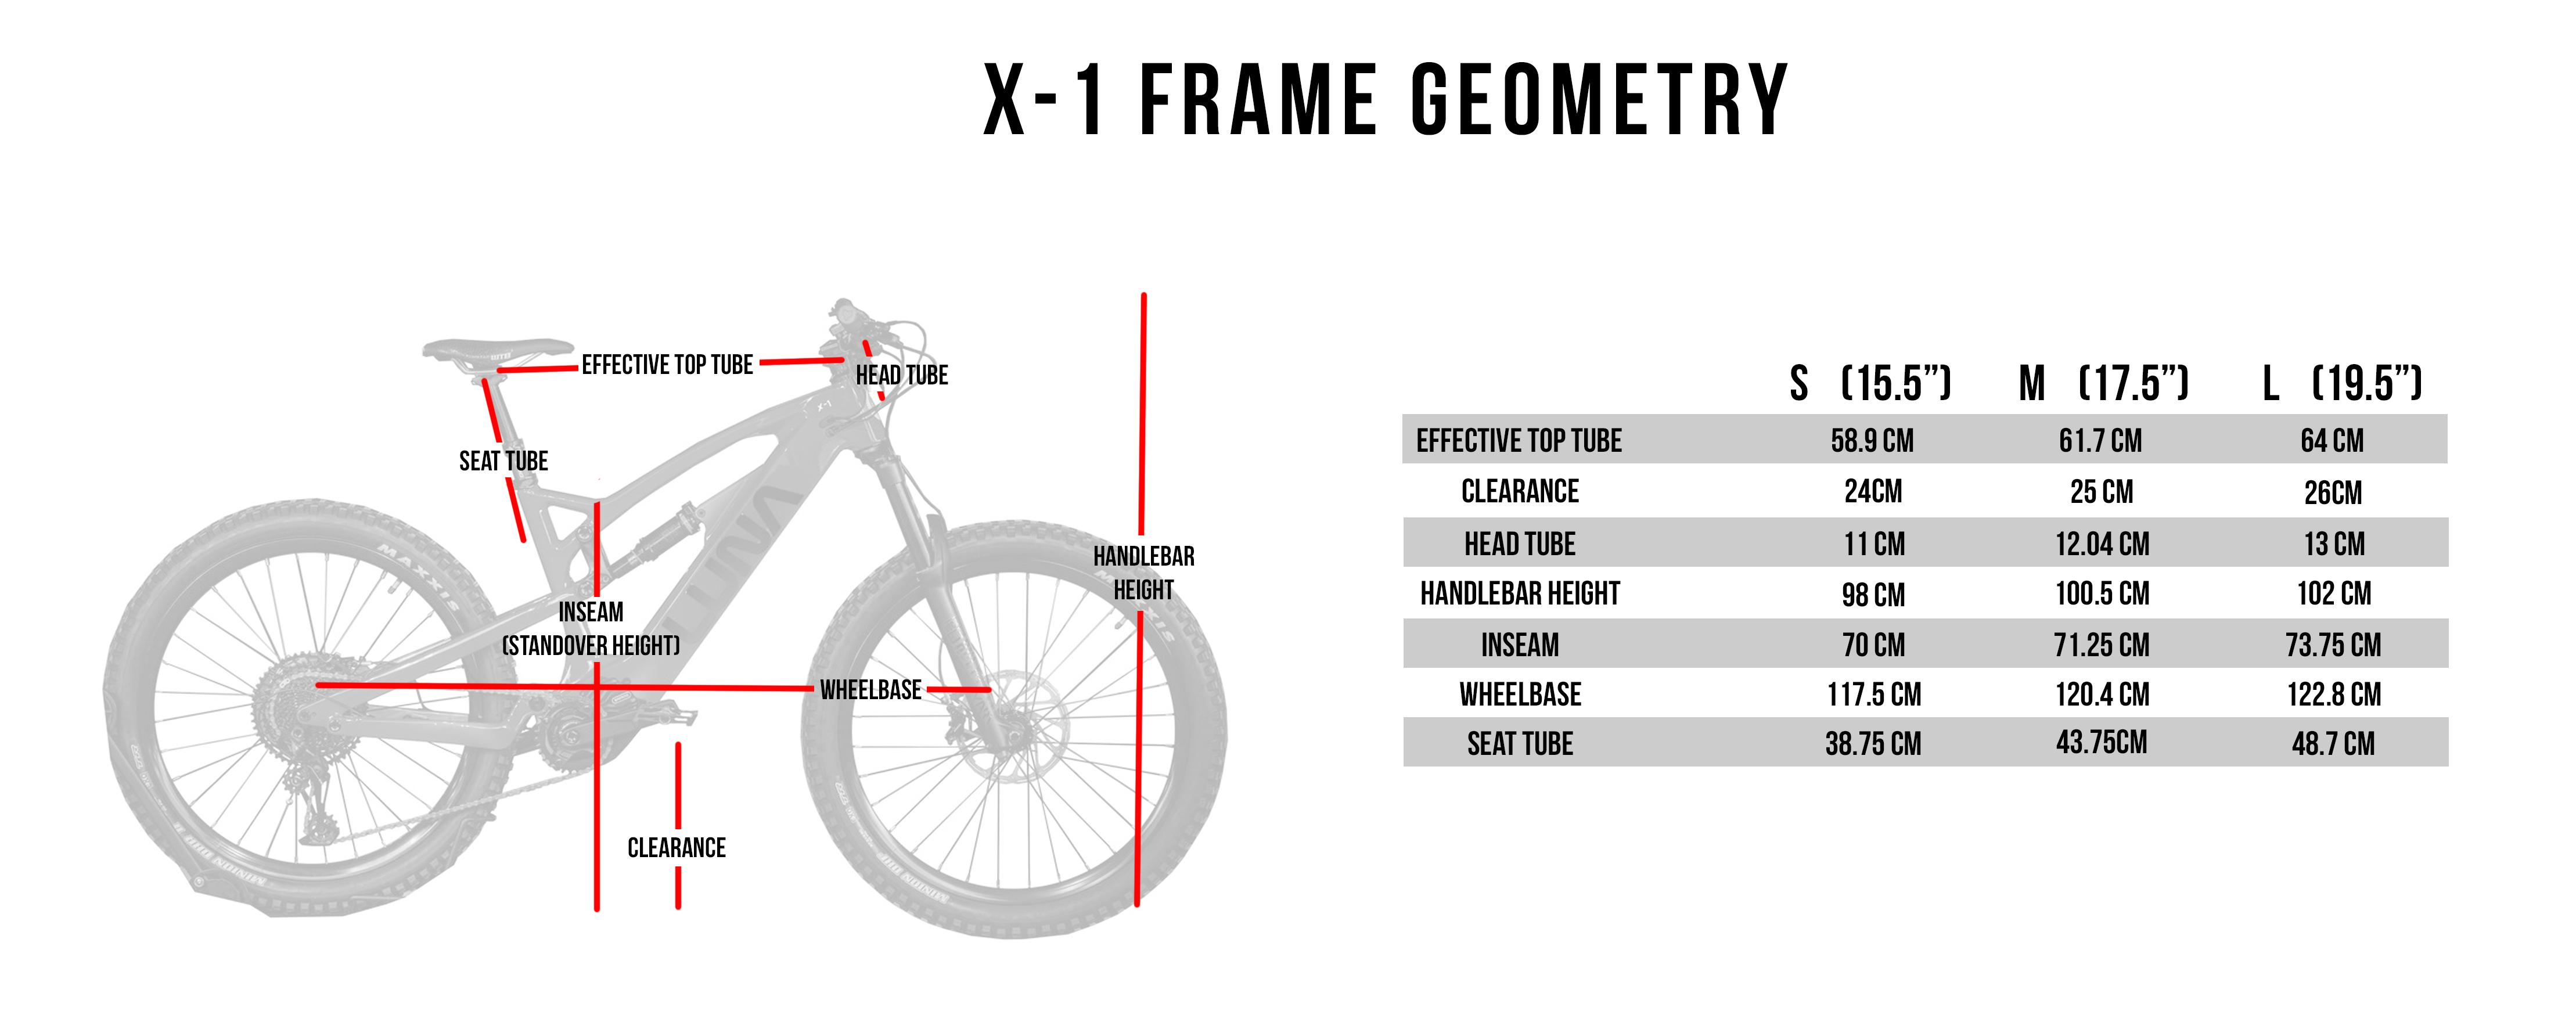 X1 Frame Geometry